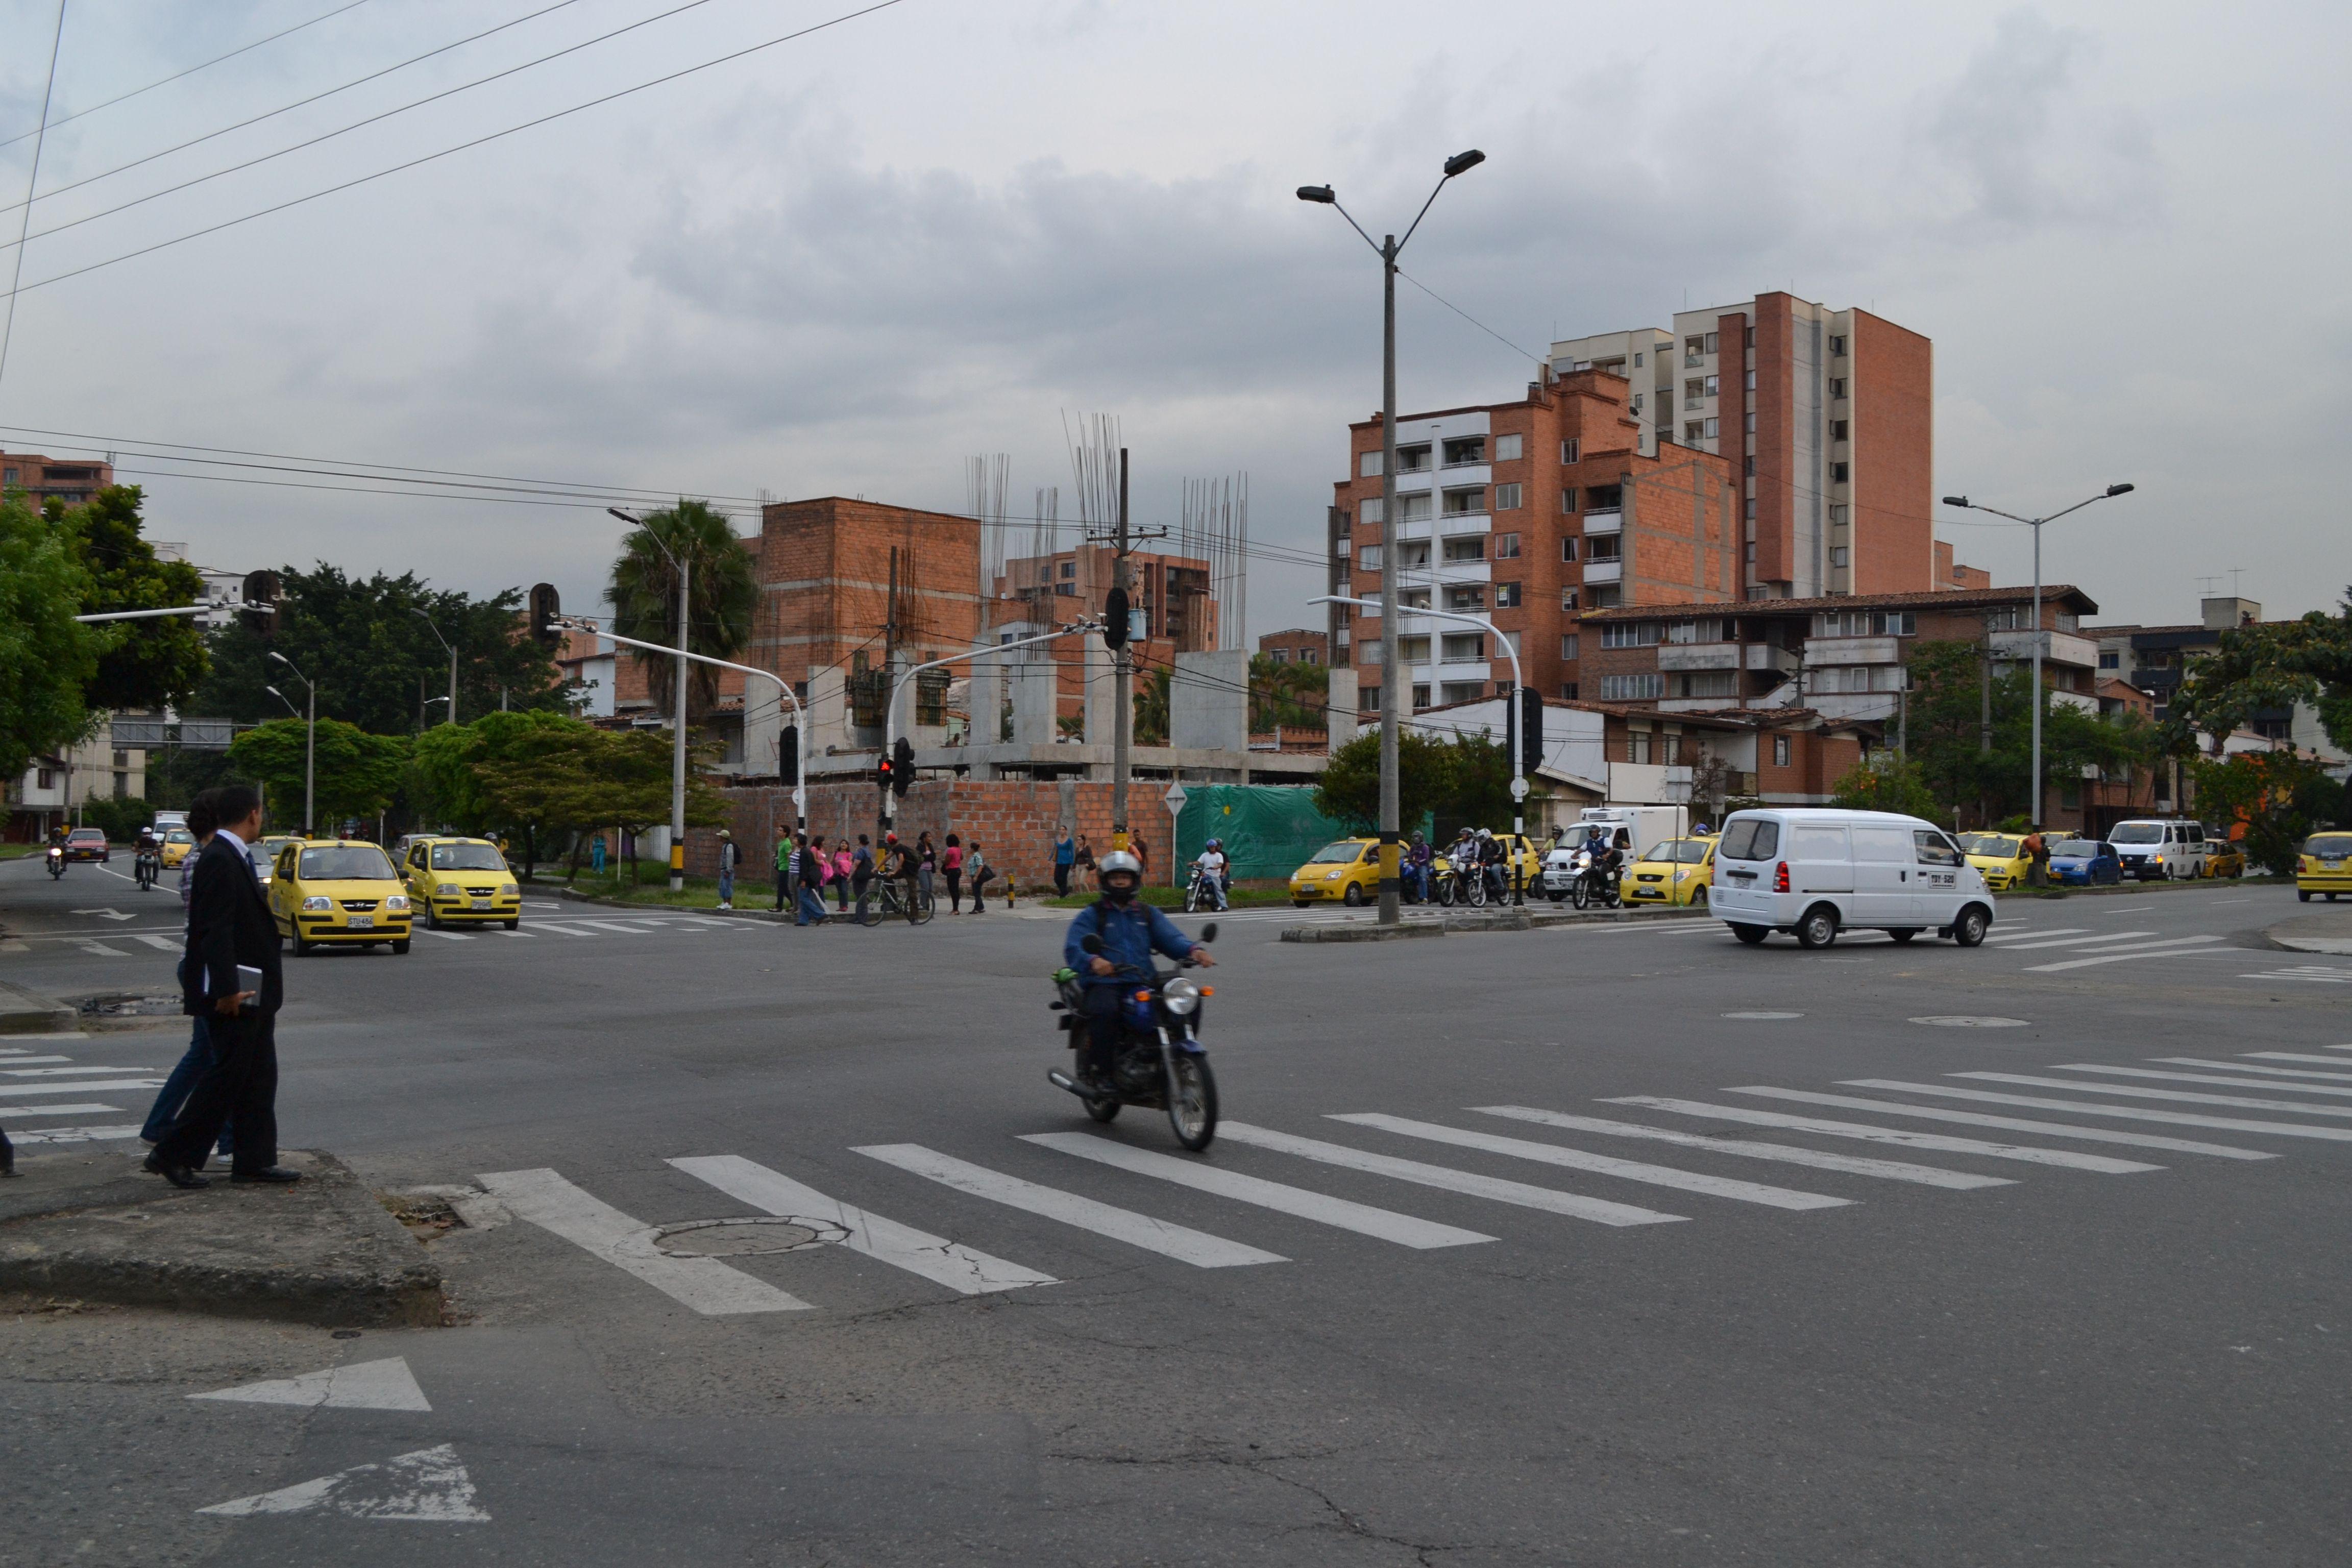 Día sin carro en Medellín. Lugar: Av Bolivariana con carrrera 65. Fecha: 23 de abril de 2012 - 5:33pm